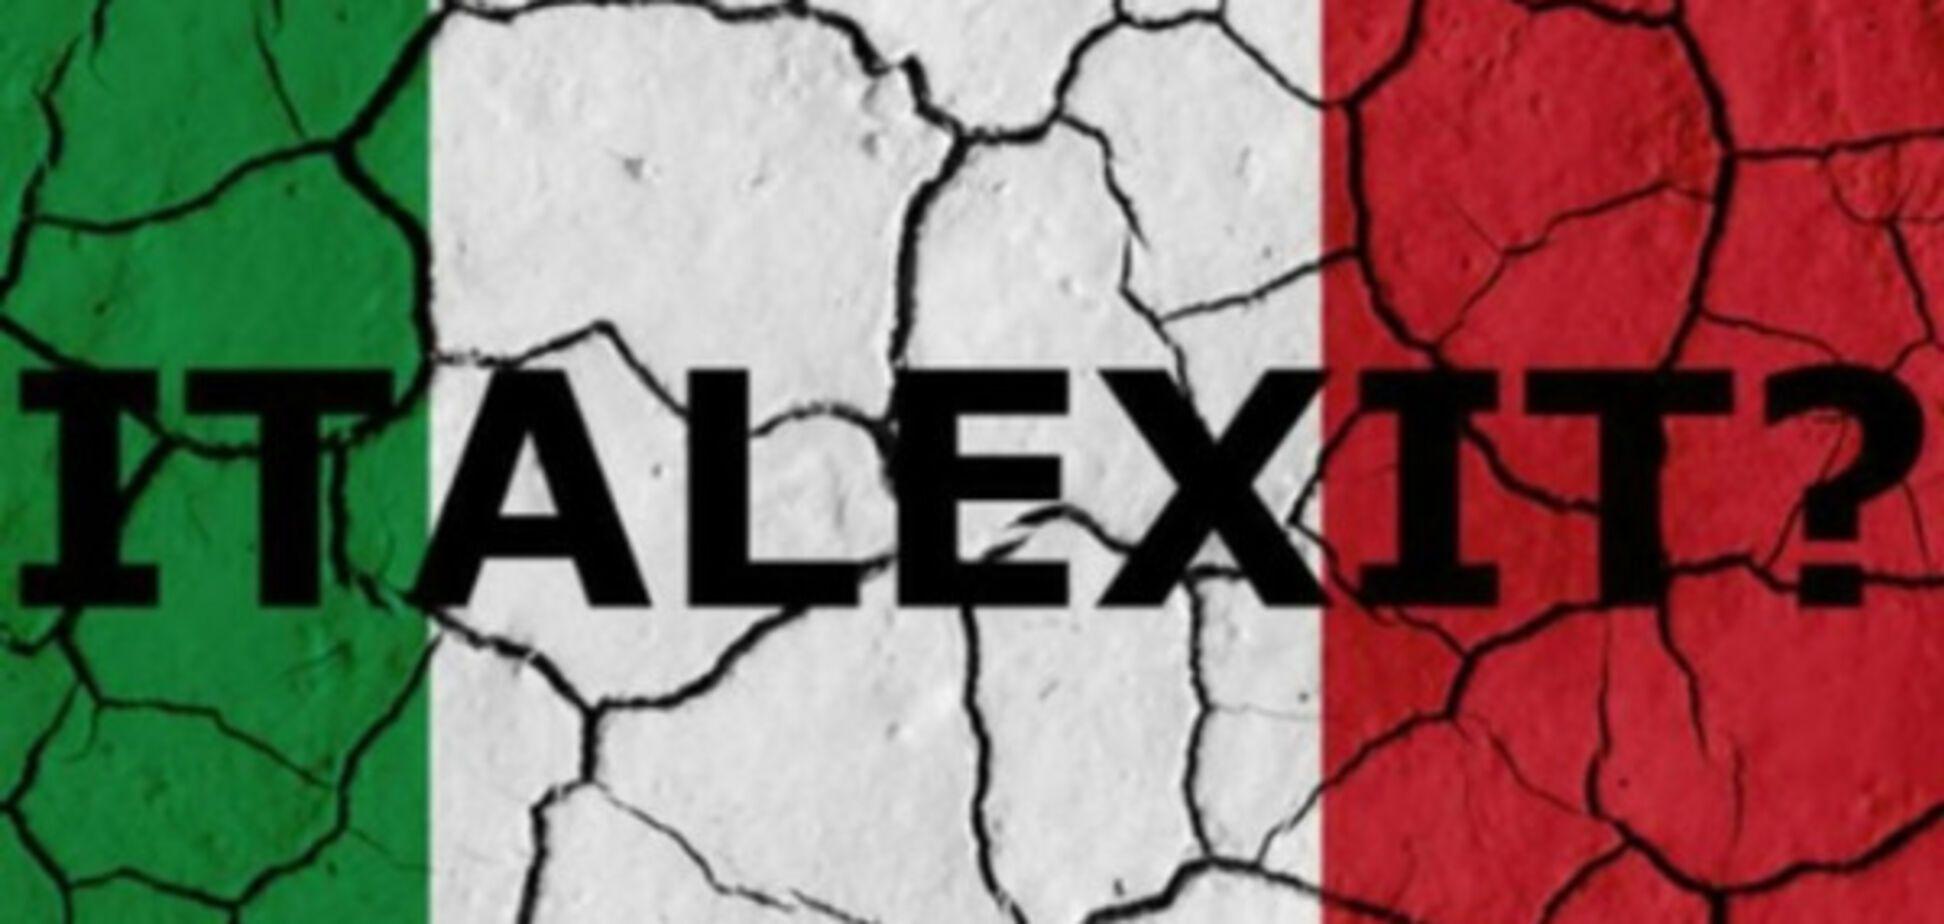 Европа в канун Рождества: тревожние итальянские разборки